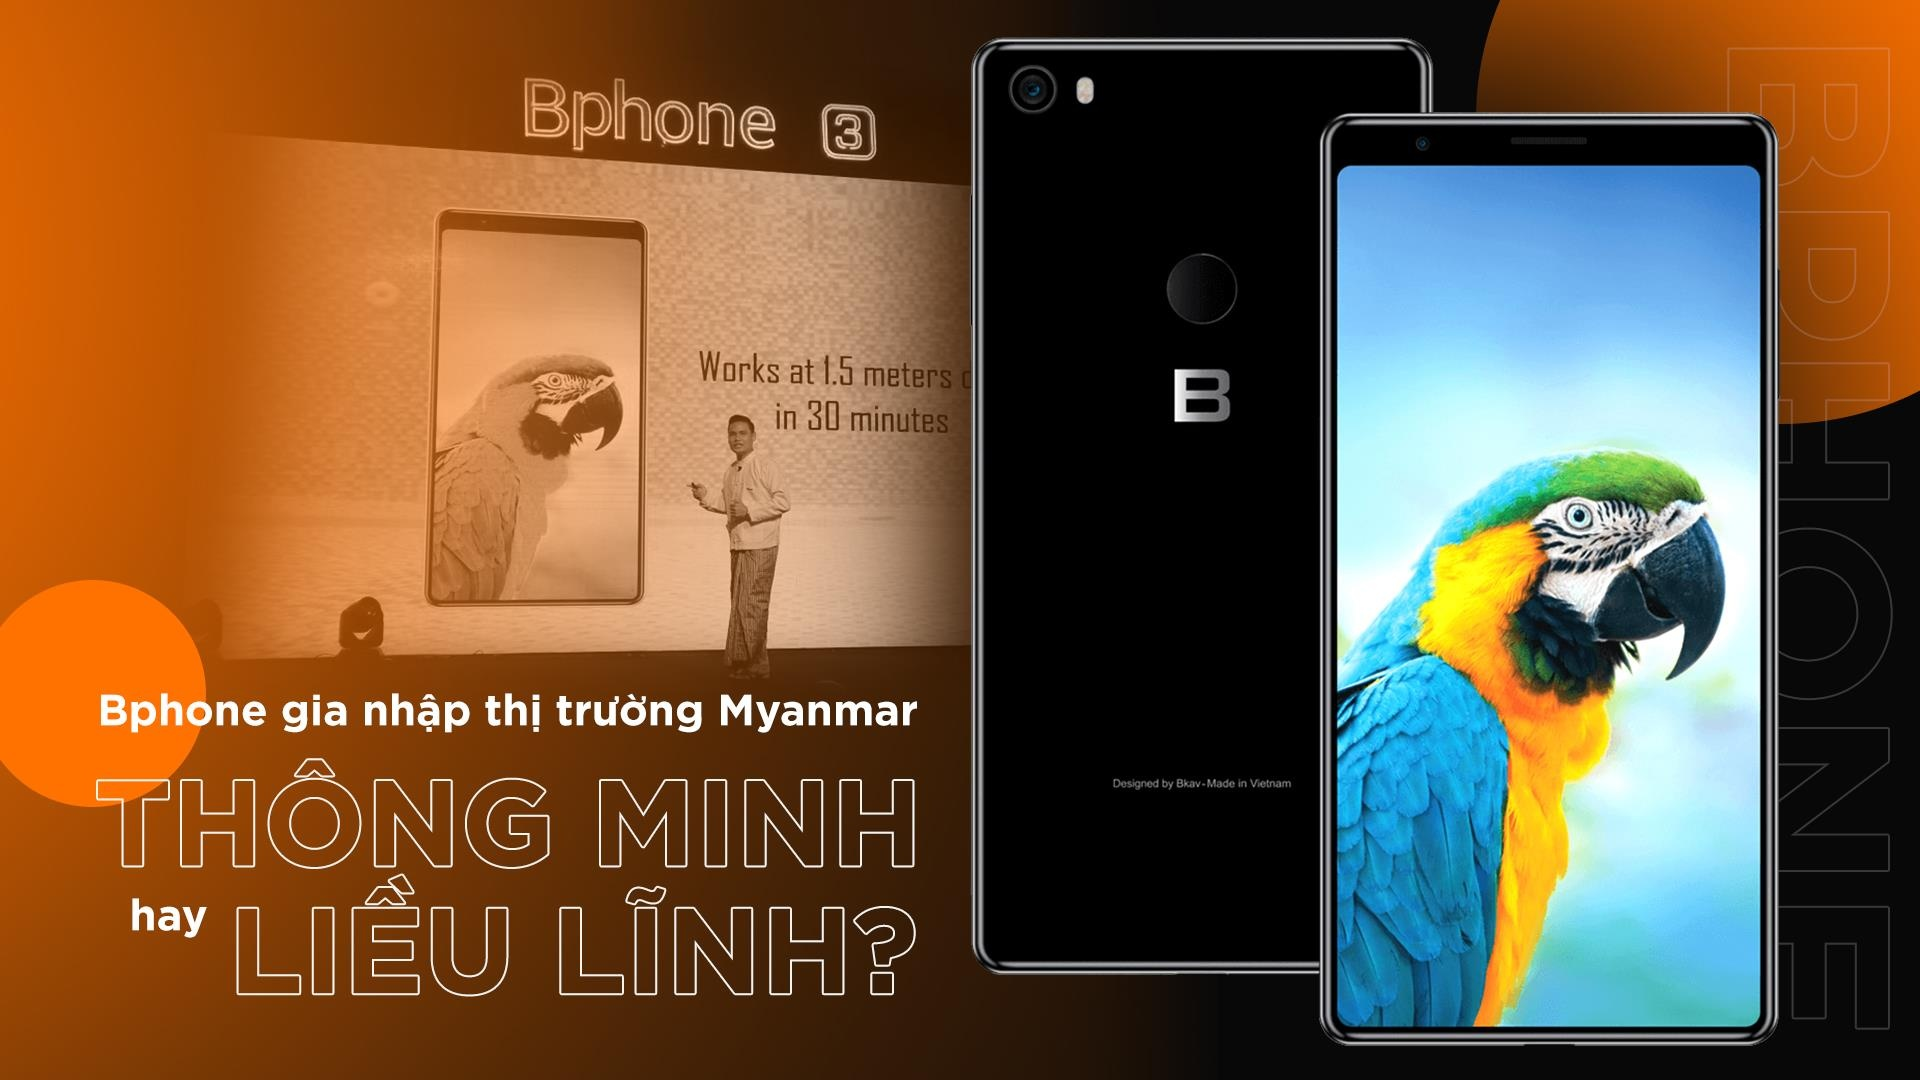 Bphone gia nhap thi truong Myanmar - thong minh hay lieu linh? hinh anh 2